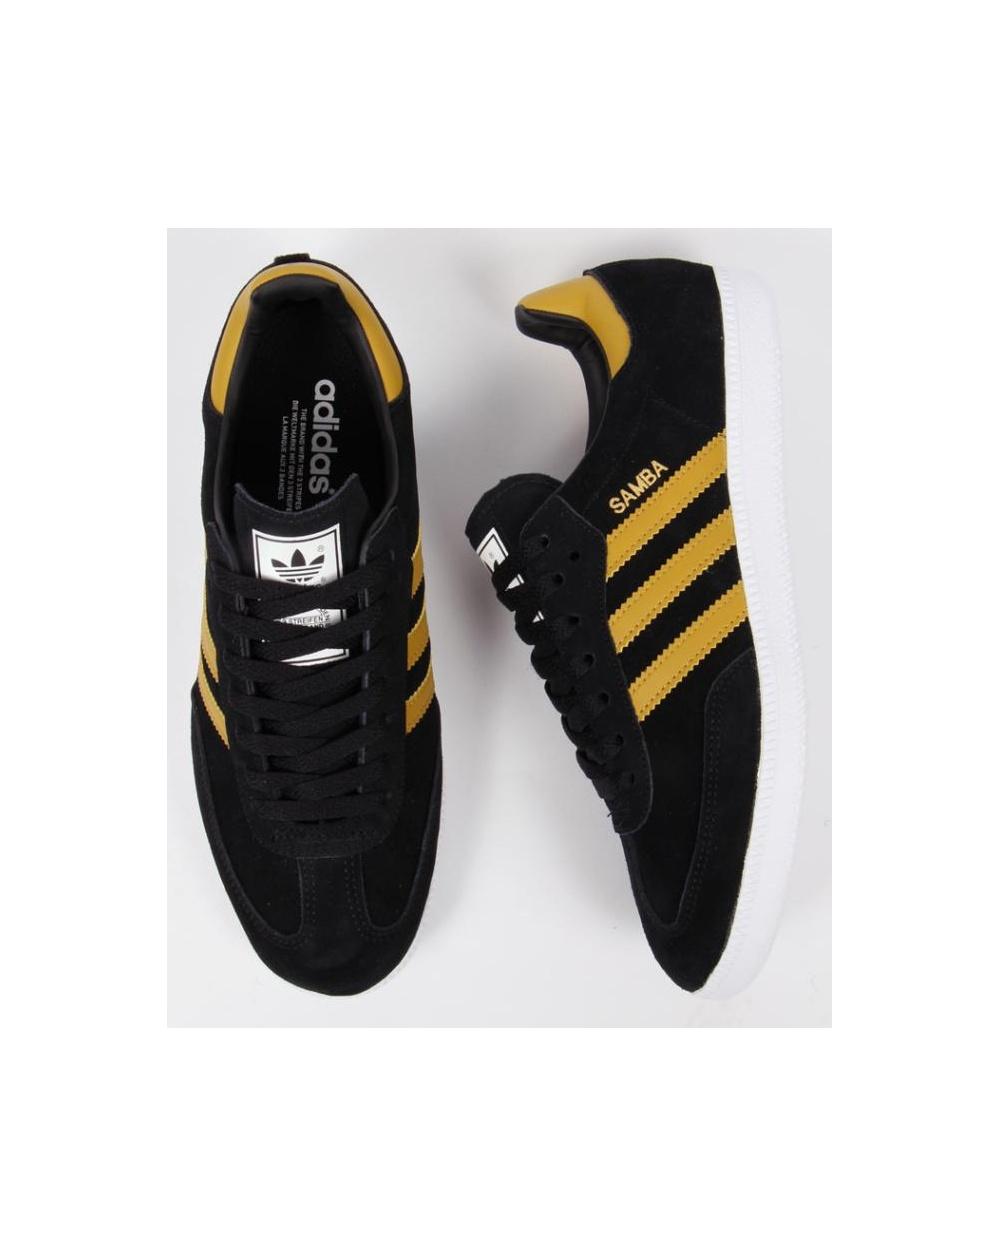 b7f8cc4b5 cheapest adidas samba trainers black yellow 3c760 949e2